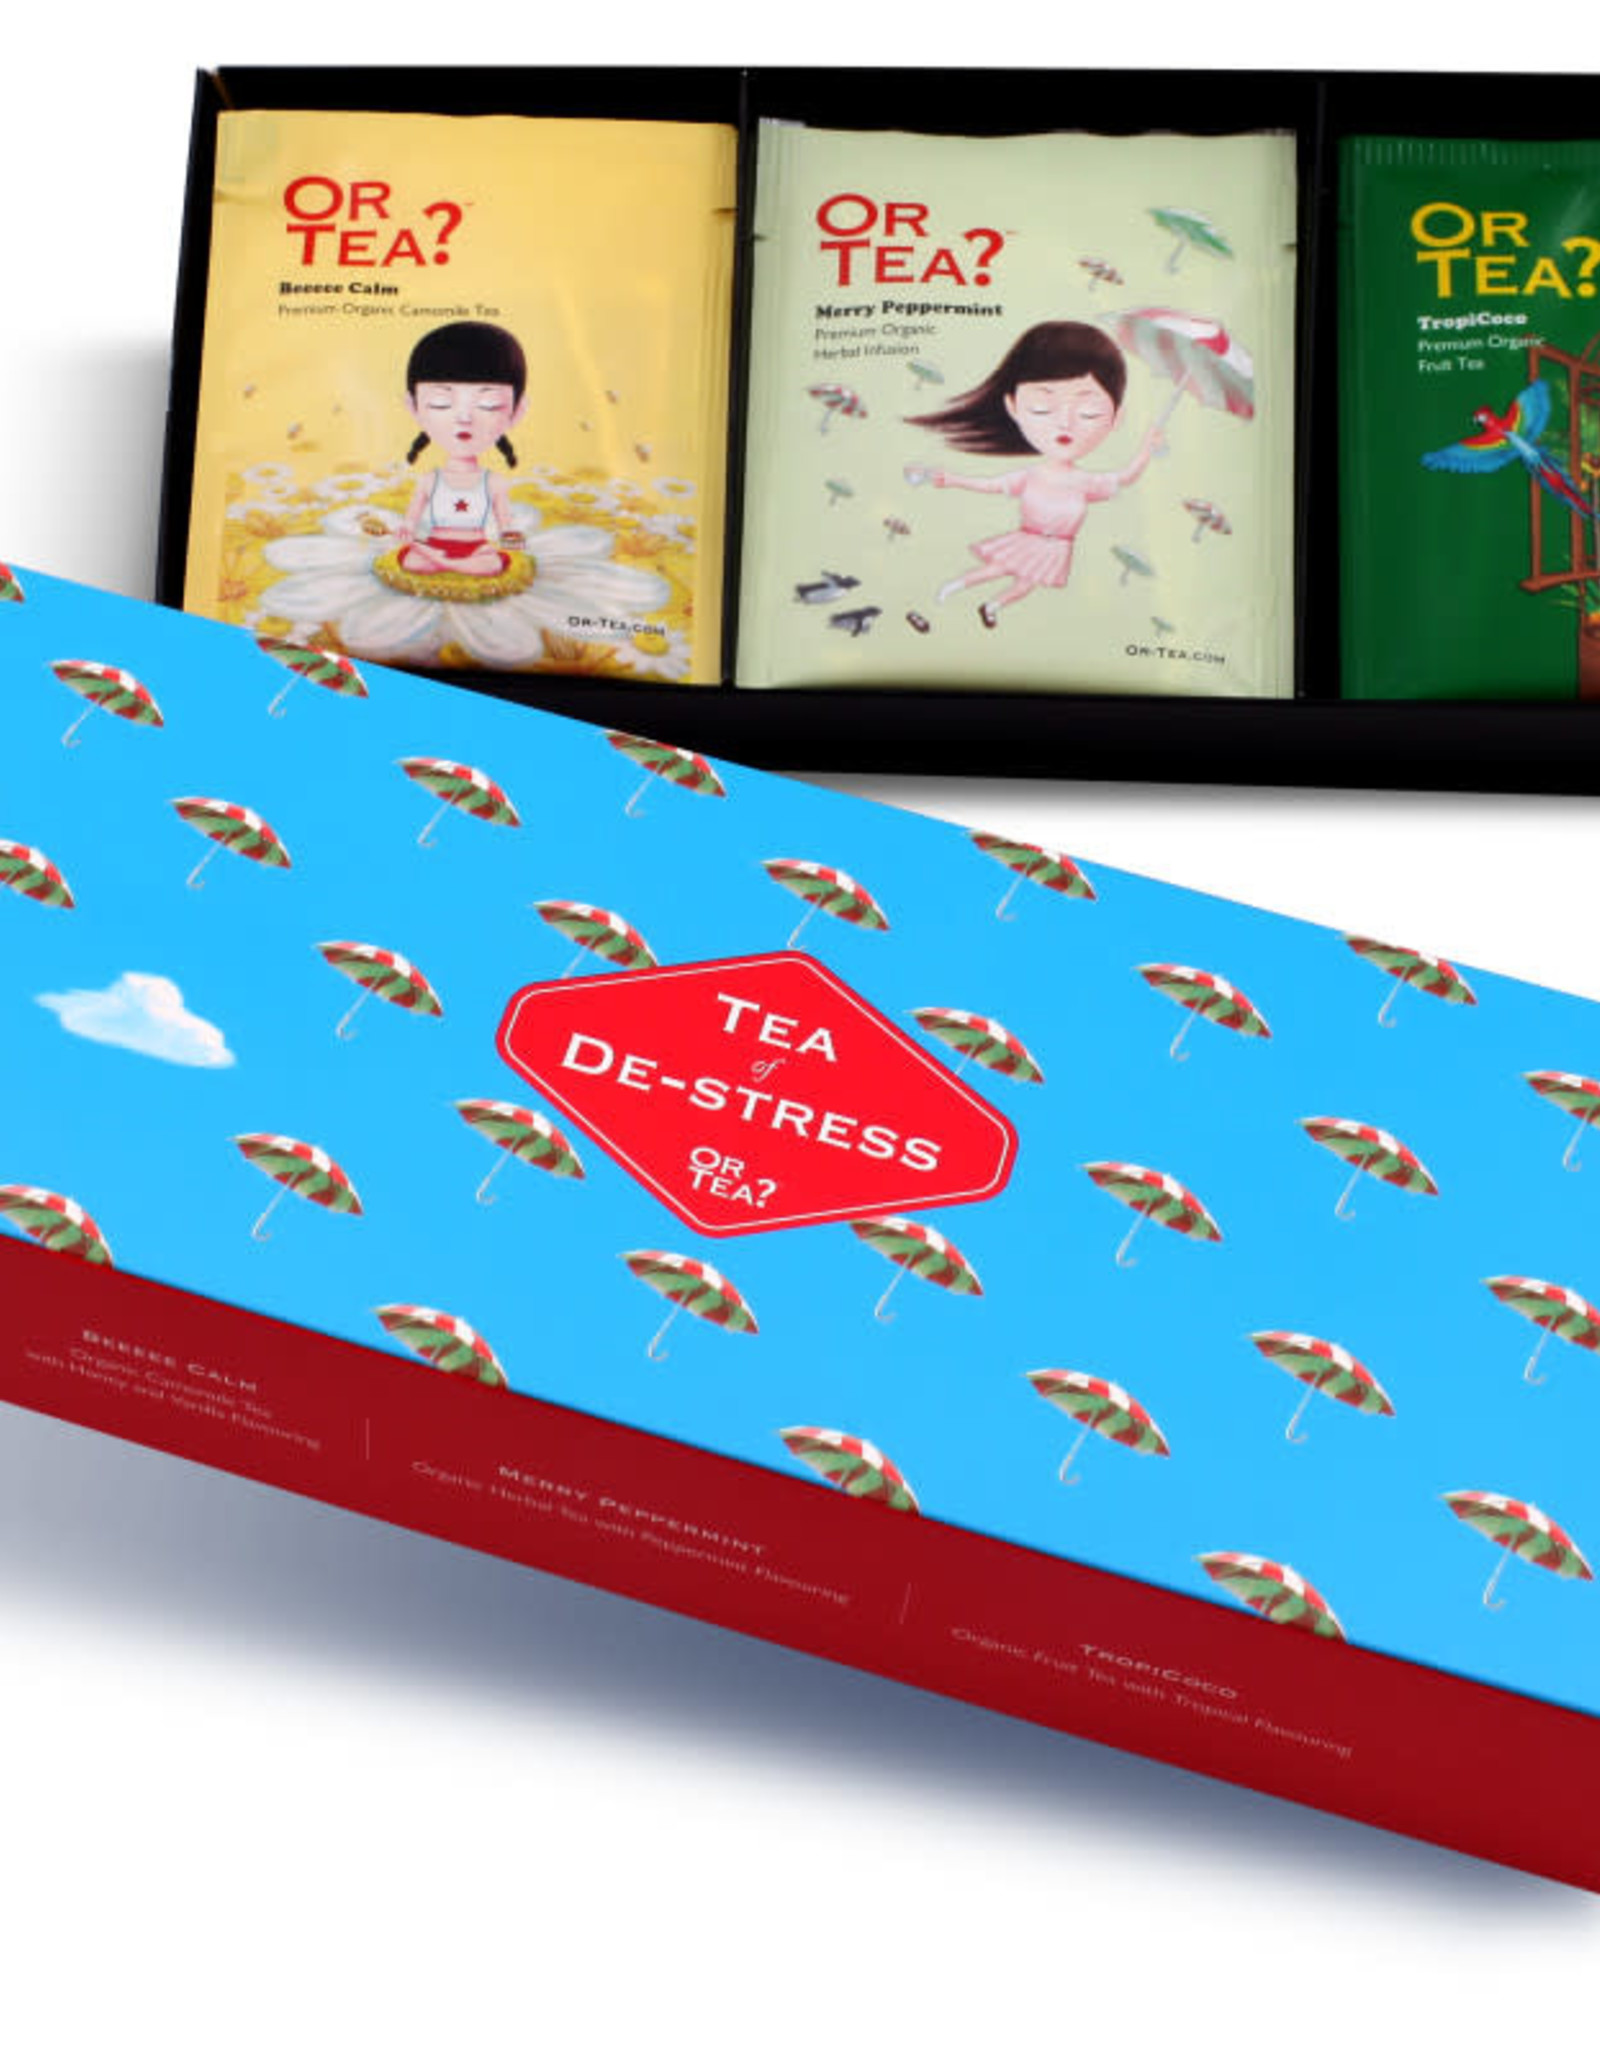 Or tea? or tea? 3-in-1 sachet combo - Tea of DE-Stress